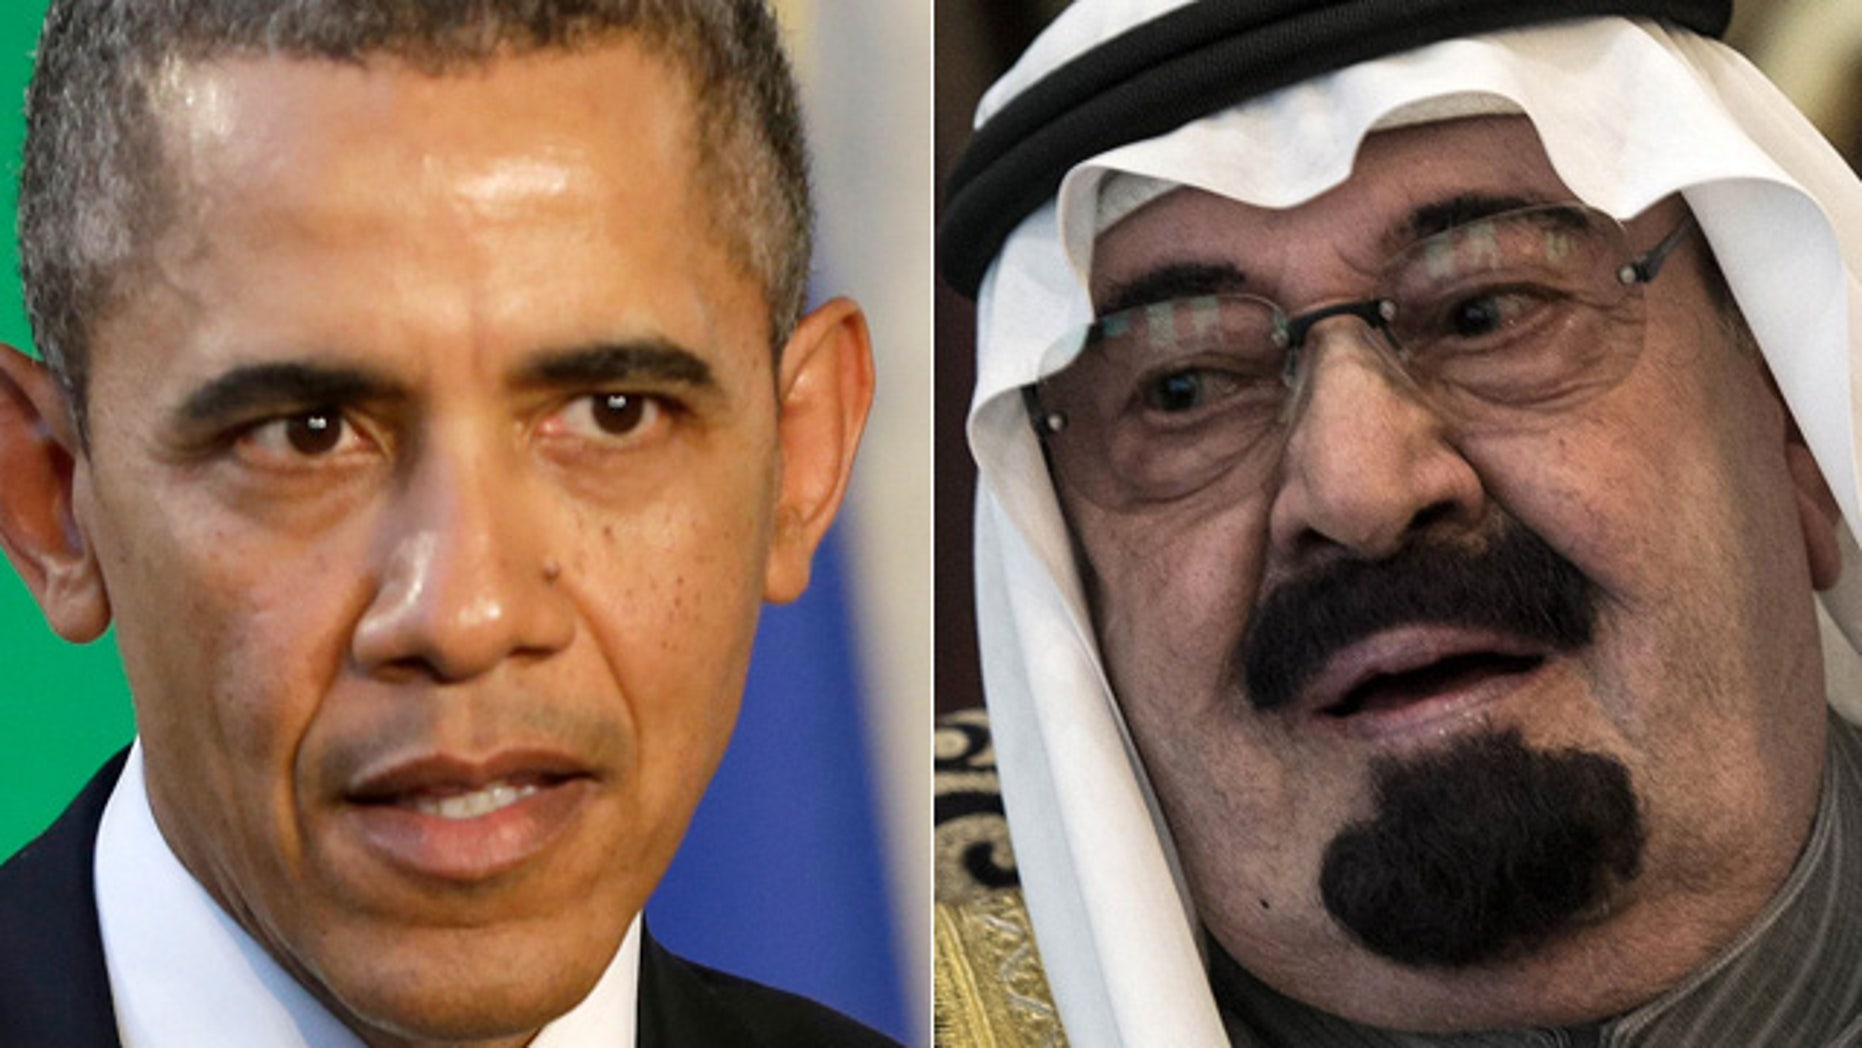 President Obama, left, and Saudi Arabia's King Abdullah.